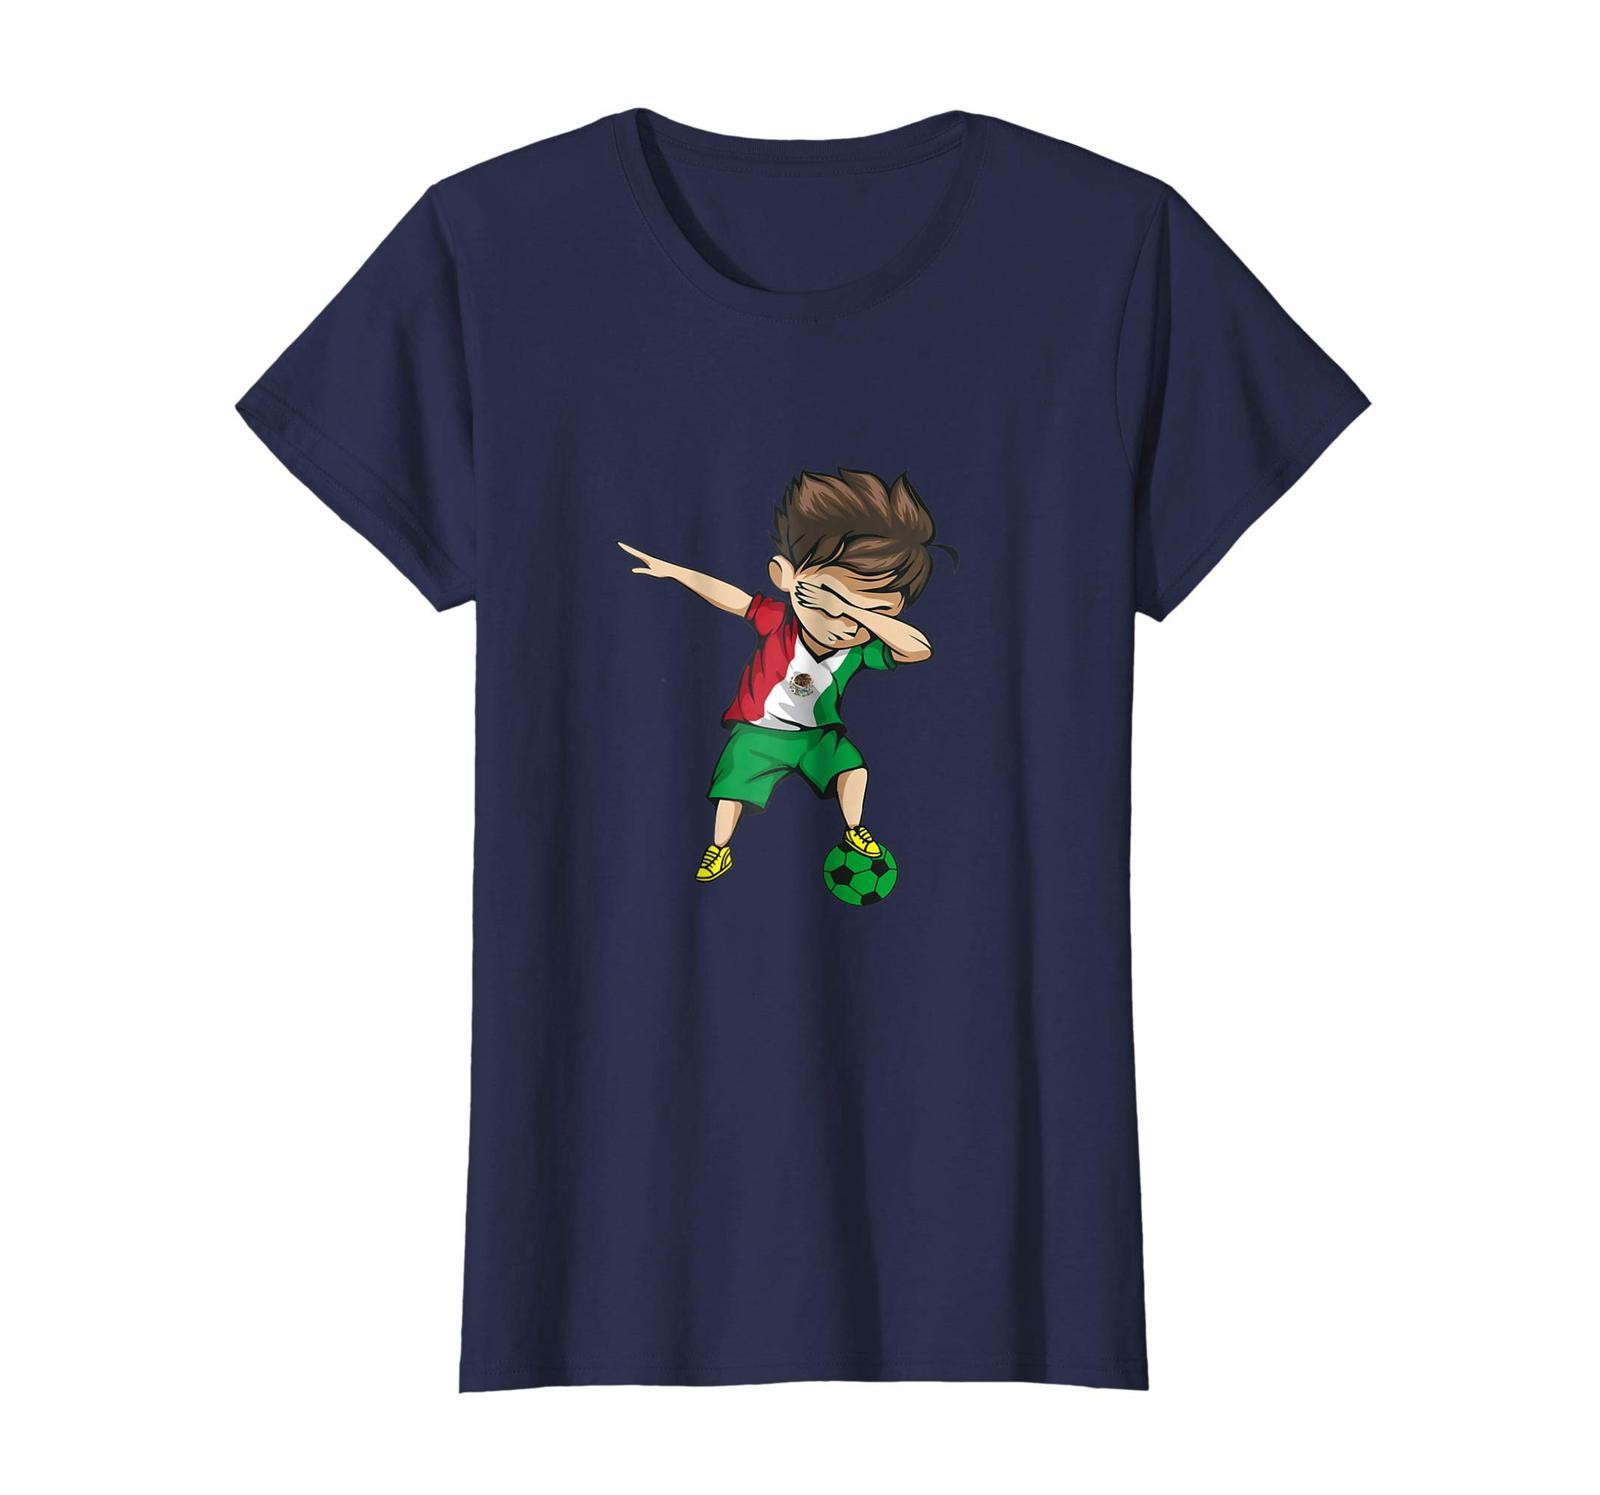 New Shirts - Dabbing Soccer Boy Mexico T-Shirt - Mexican Football Wowen